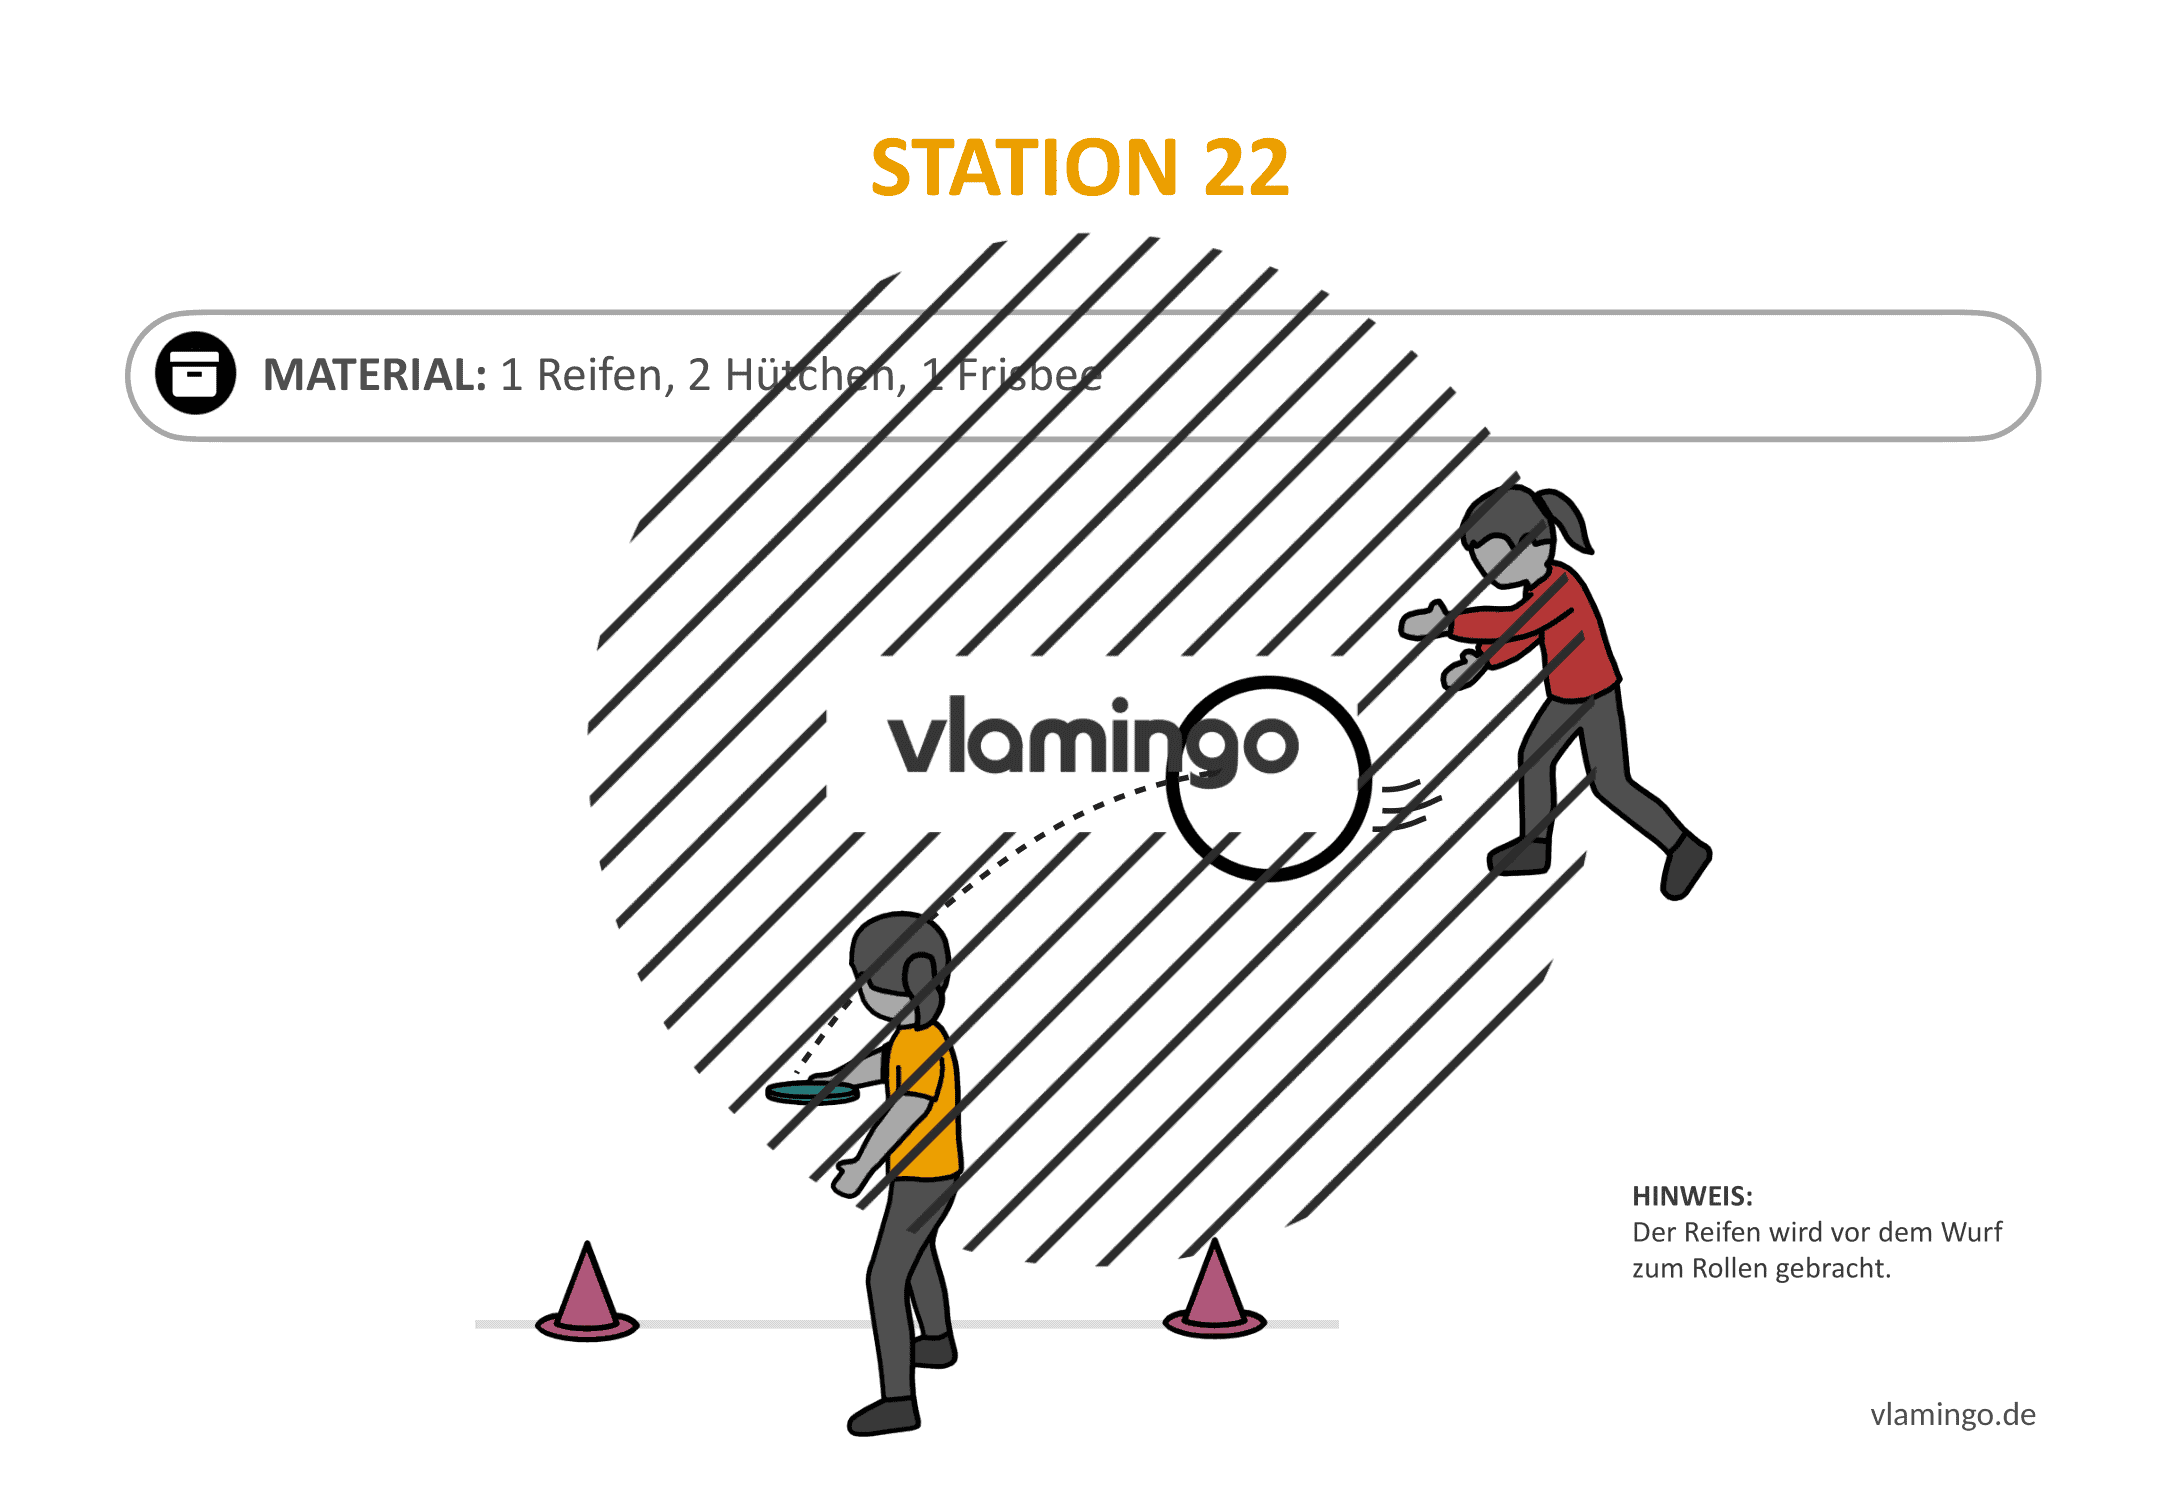 Frisbeegolf (Disc-Golf) - Station 22